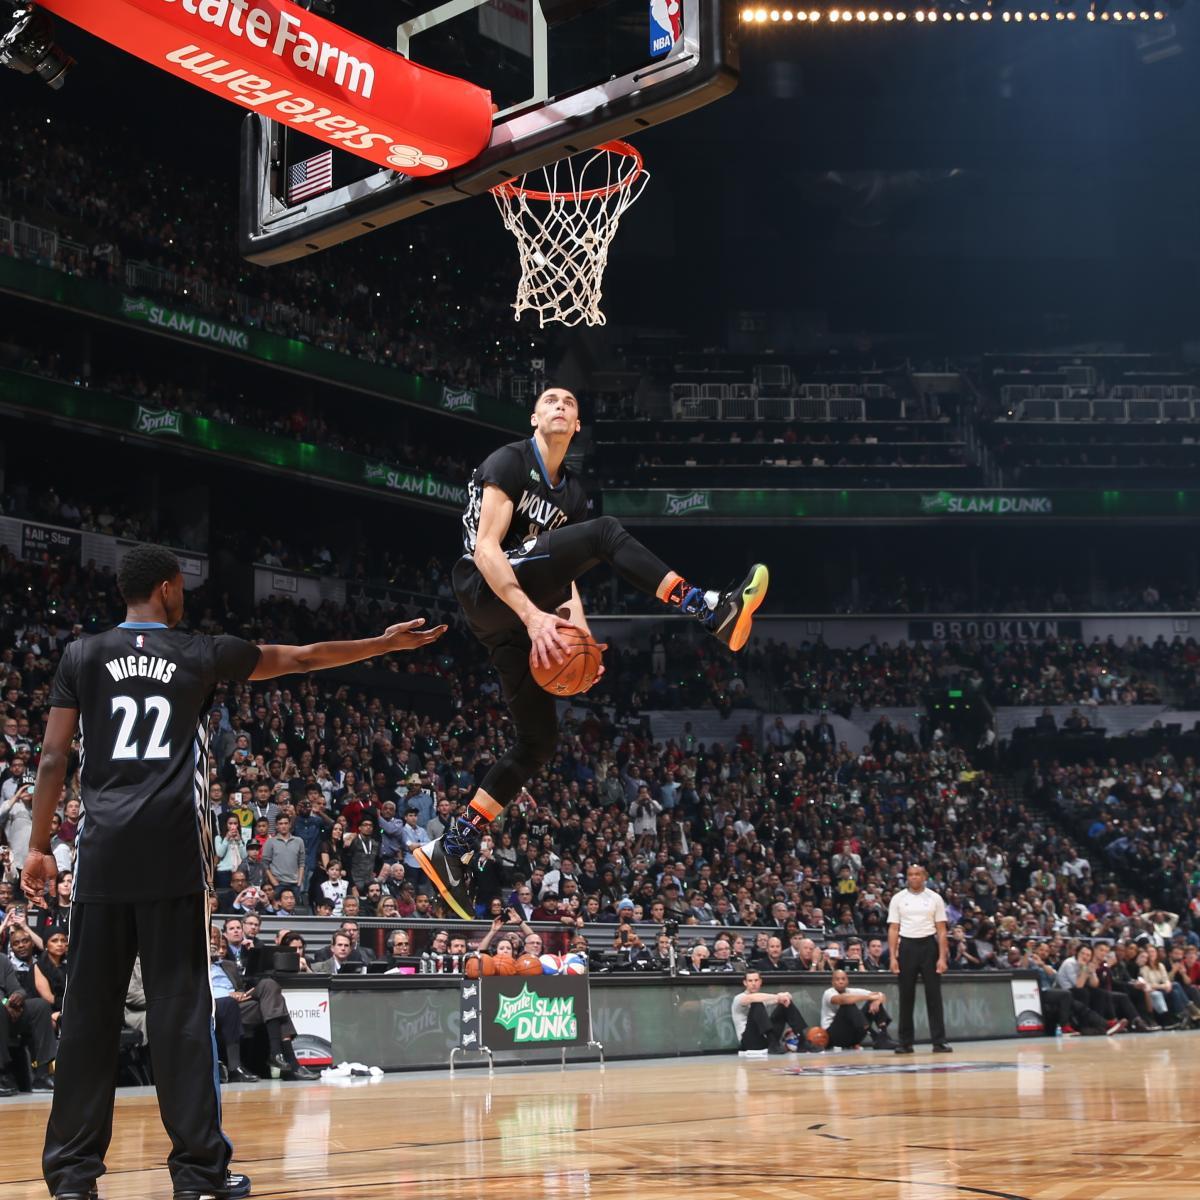 NBA Slam Dunk Contest 2015: New Format Revitalized